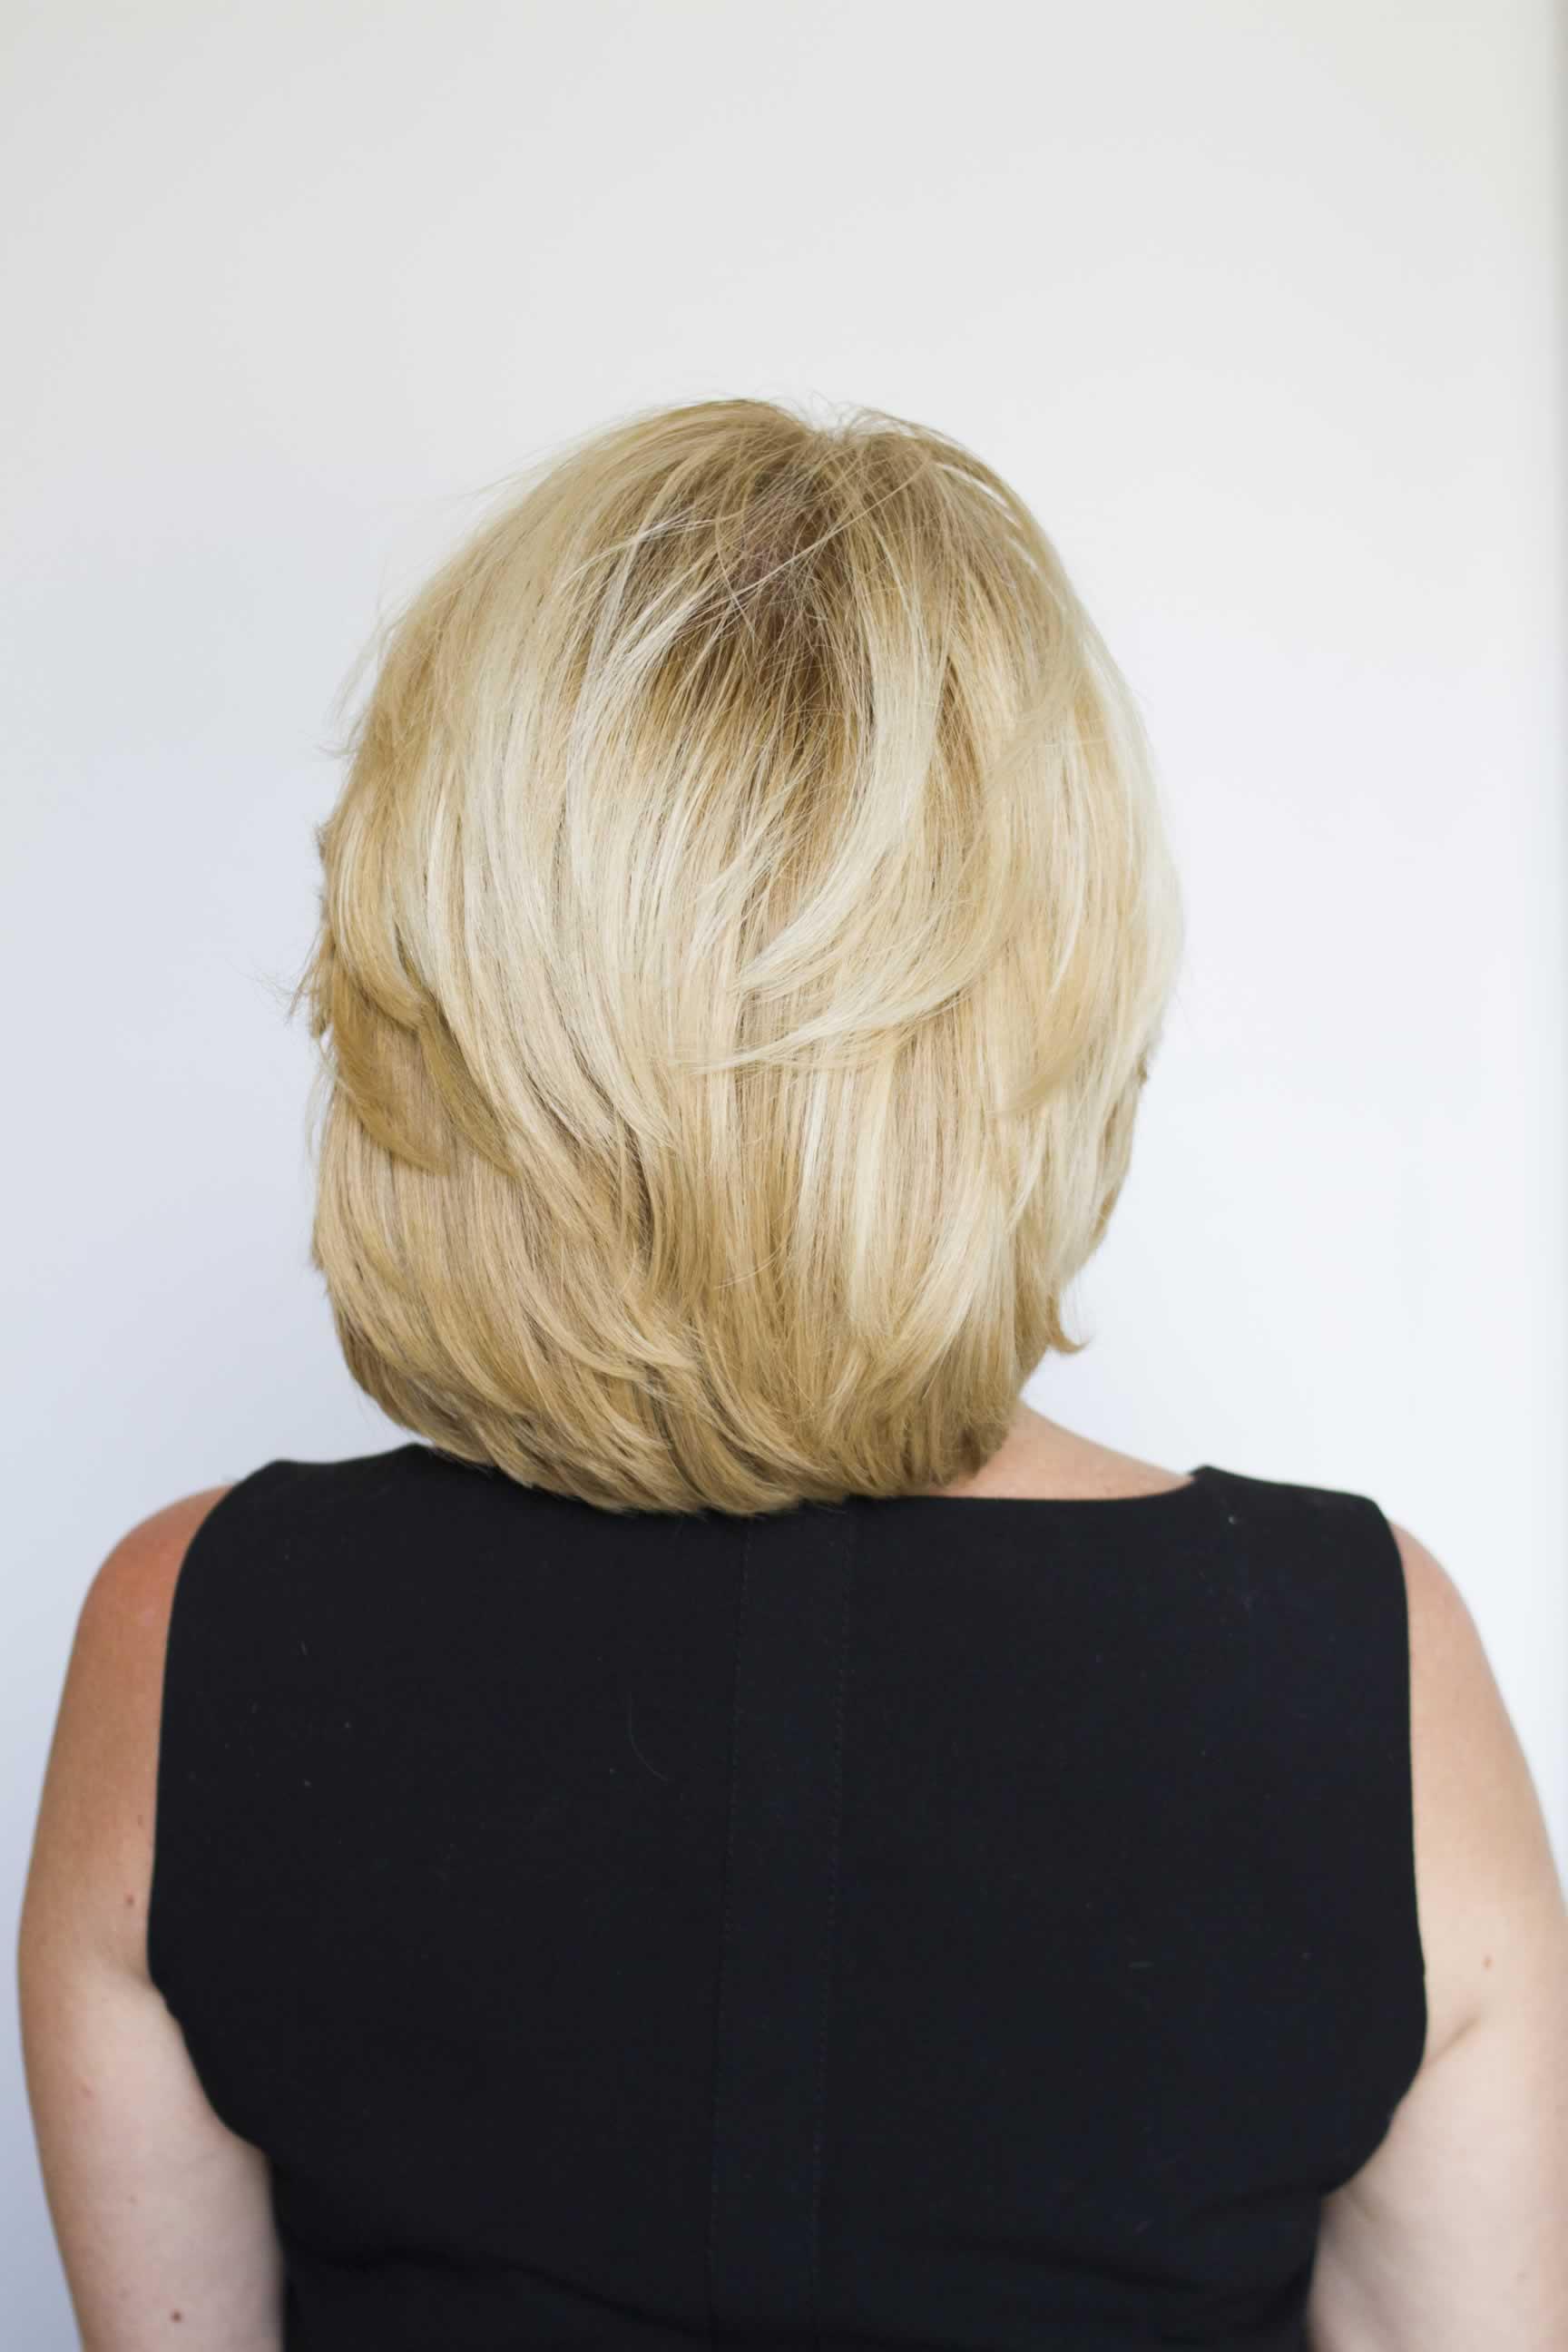 Blonde woman in black shirt